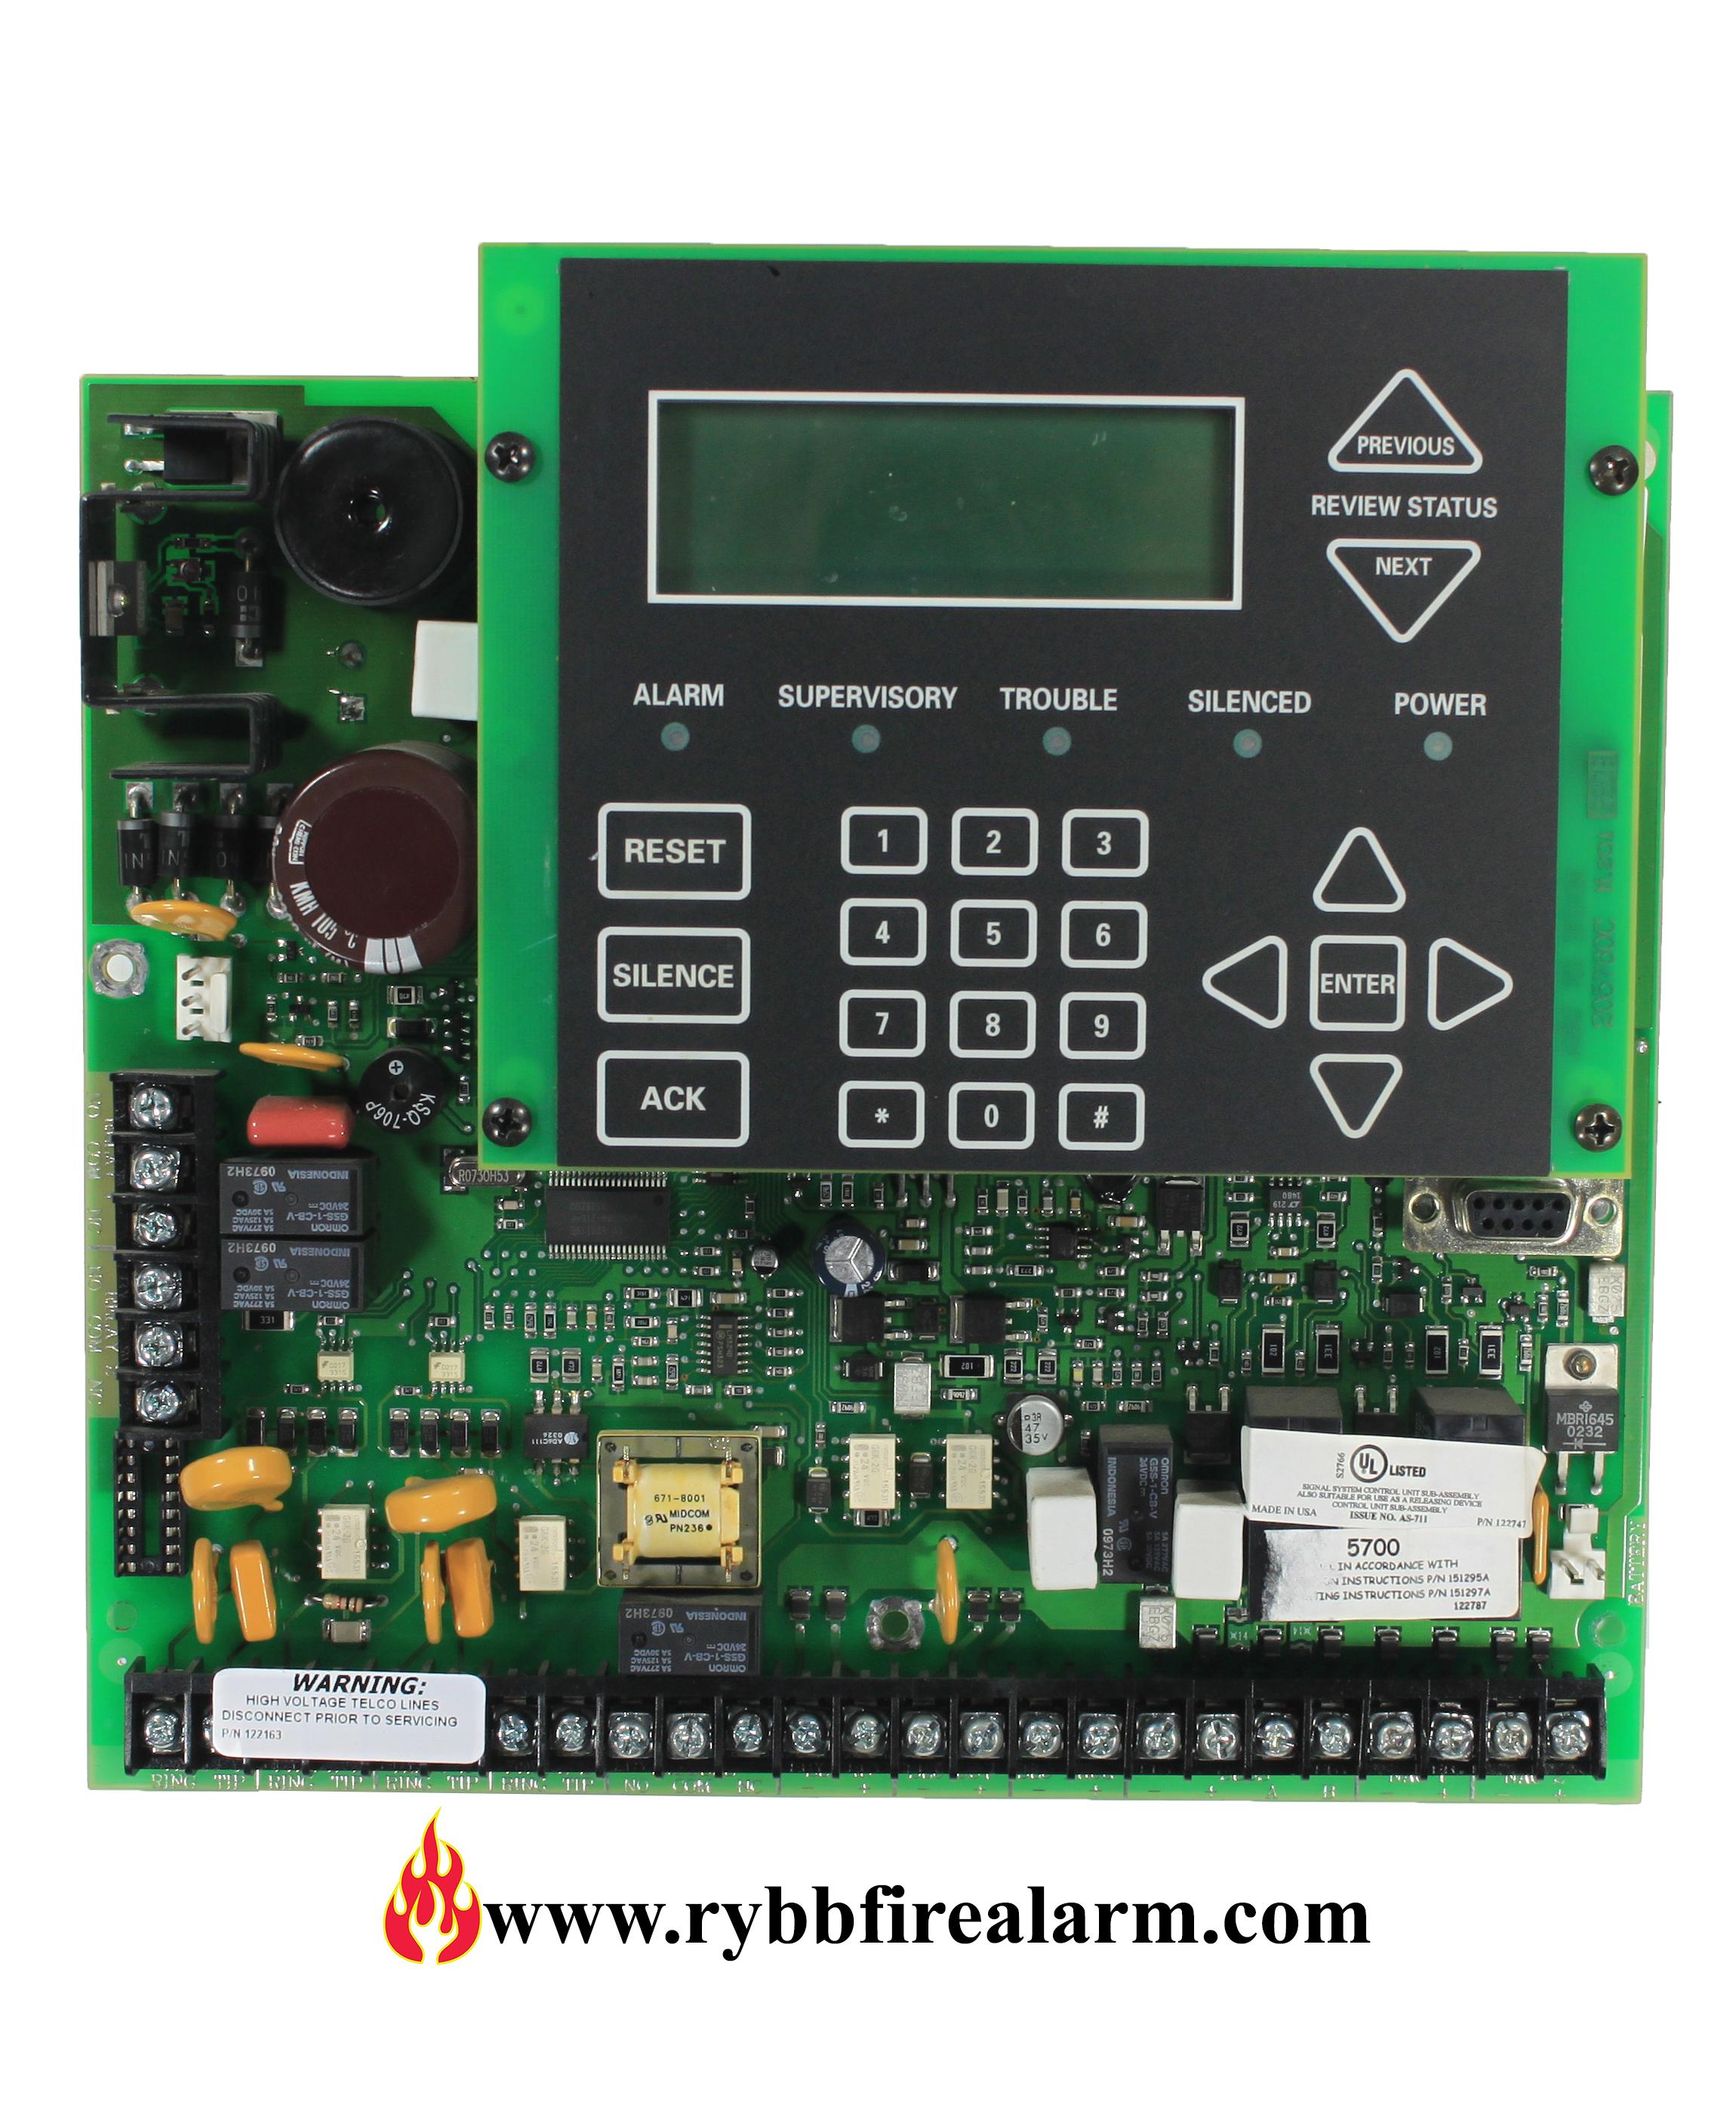 Silent Knight Intelliknight 5700 Fire Alarm Control Panel